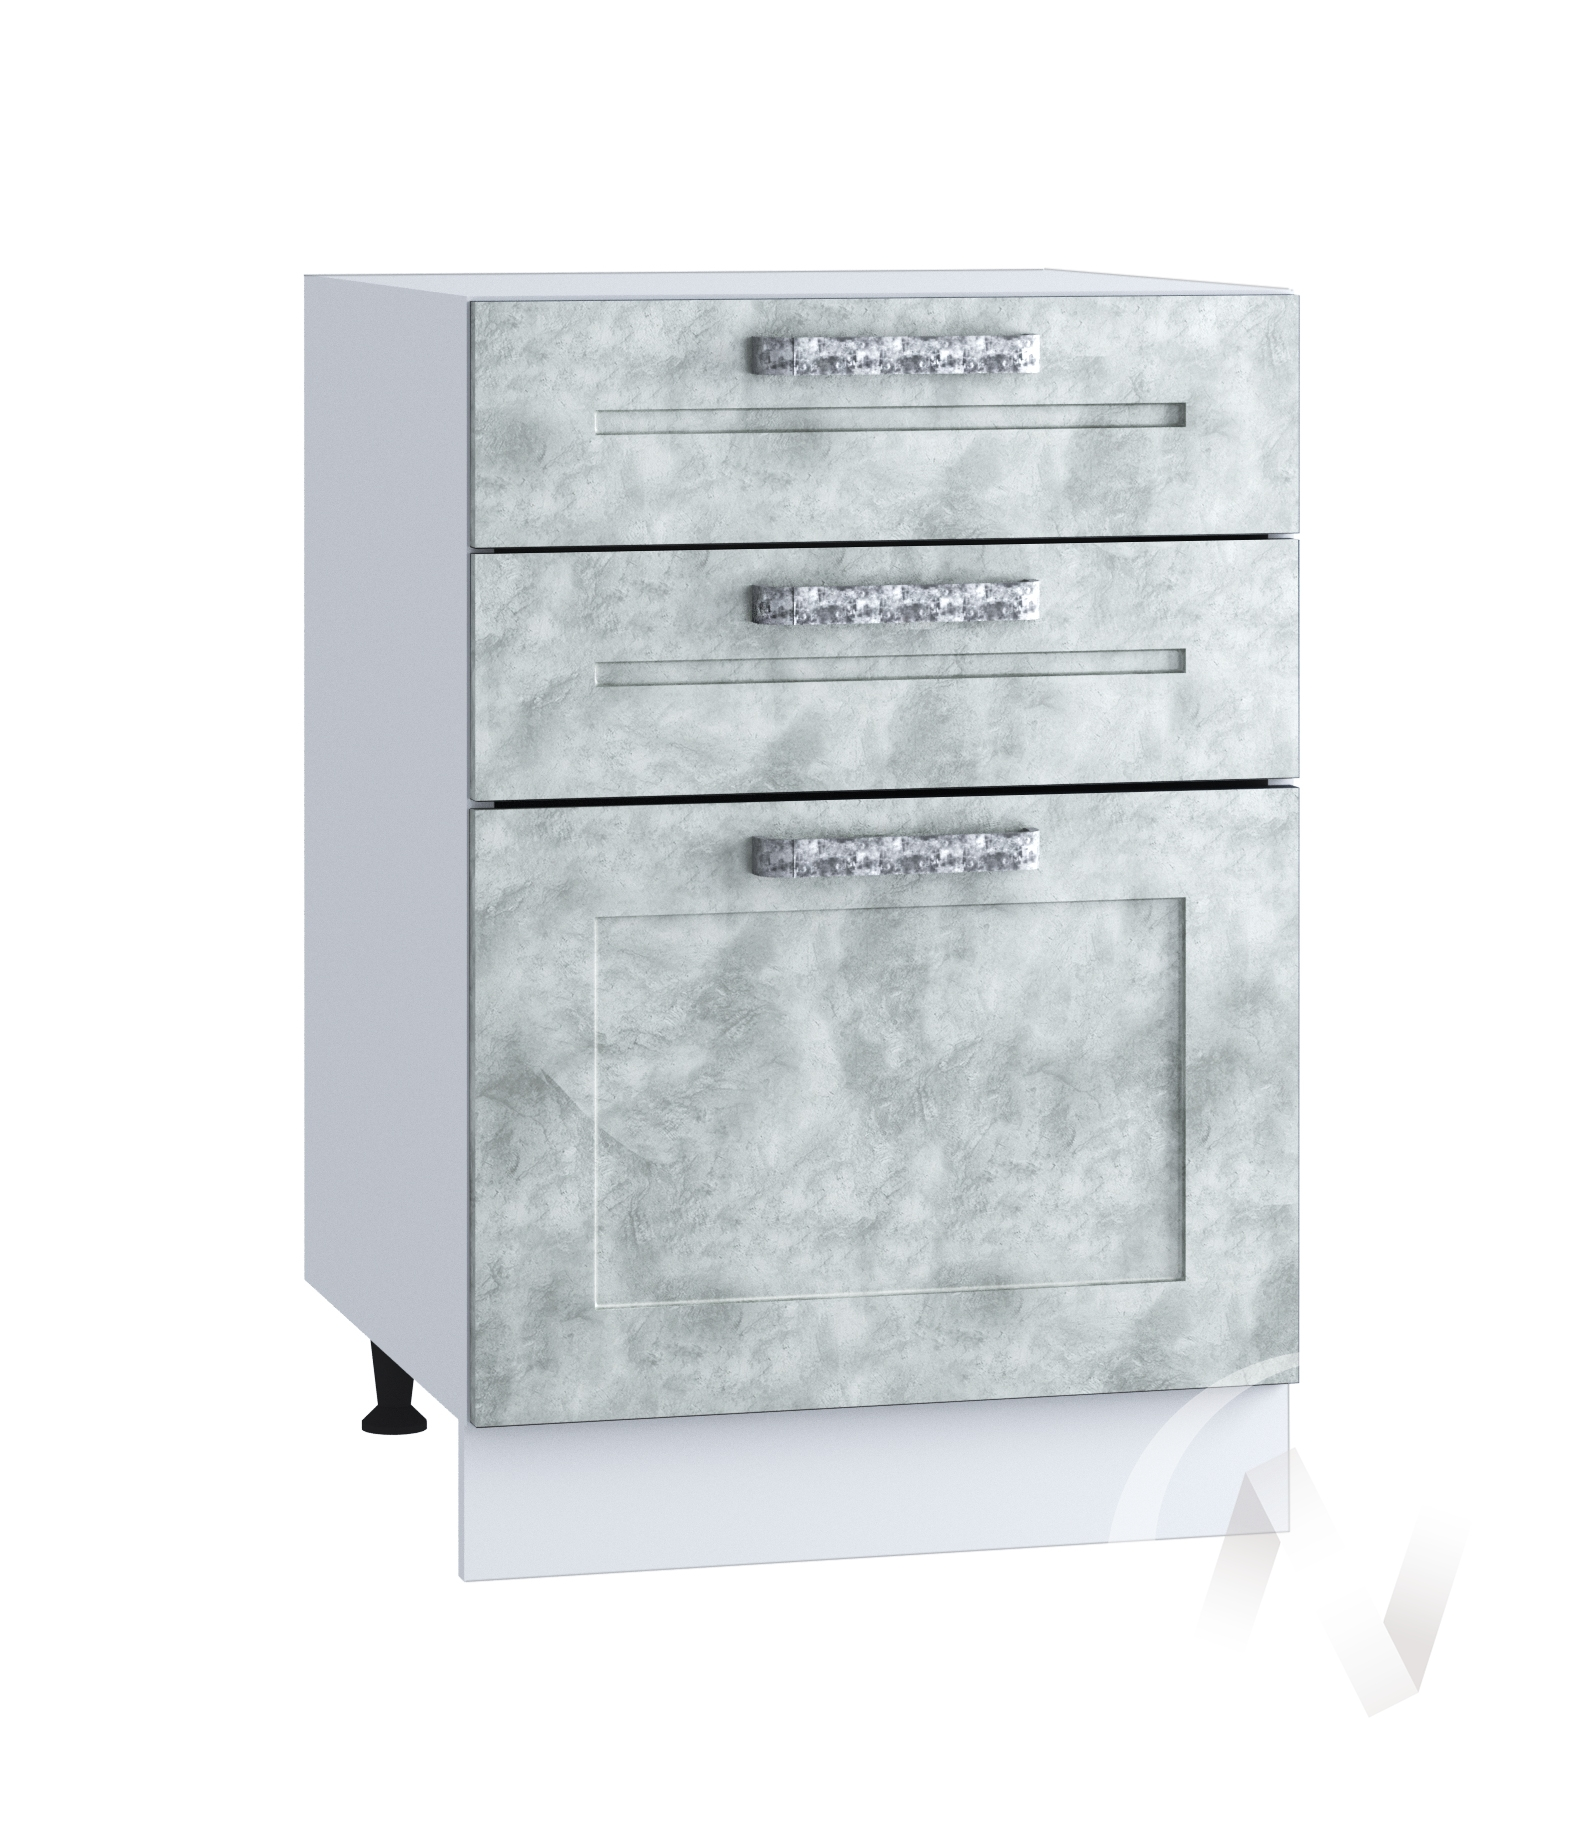 "Кухня ""Лофт"": Шкаф нижний с 3-мя ящиками 500, ШН3Я 500 (Бетон серый/корпус белый)"